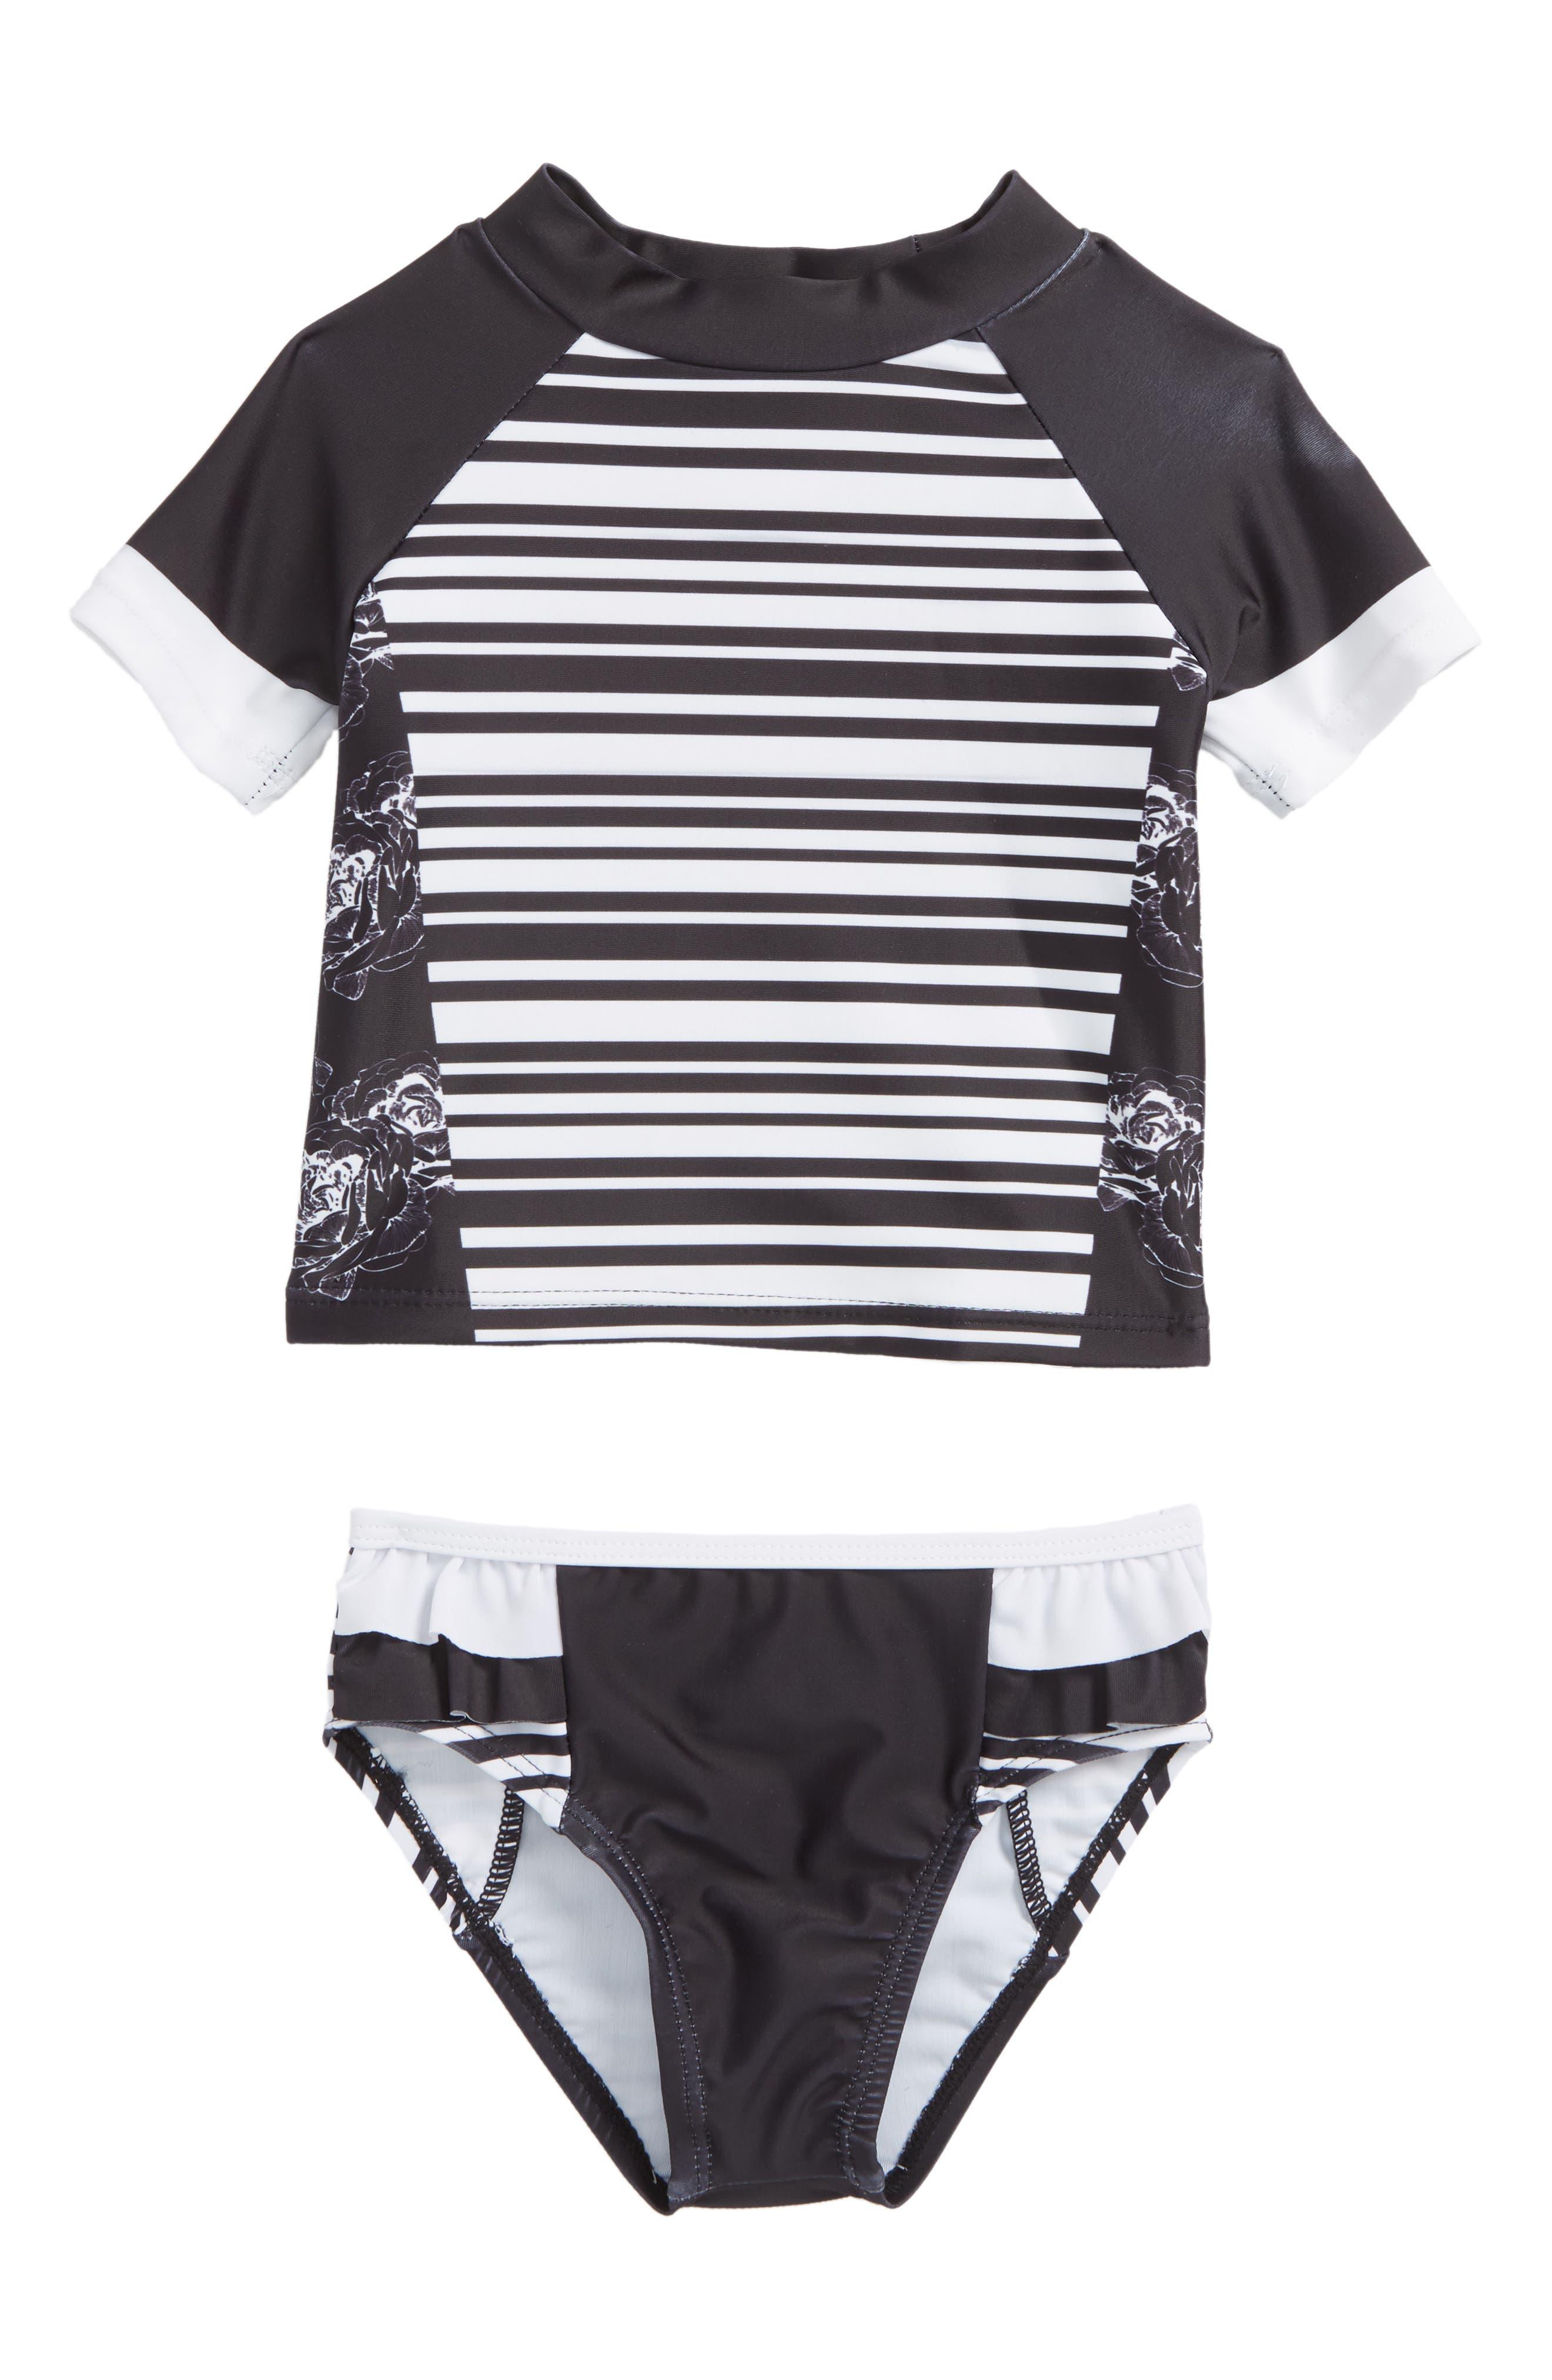 Main Image - Limeapple Two-Piece Rashguard Swimsuit (Baby Girls)